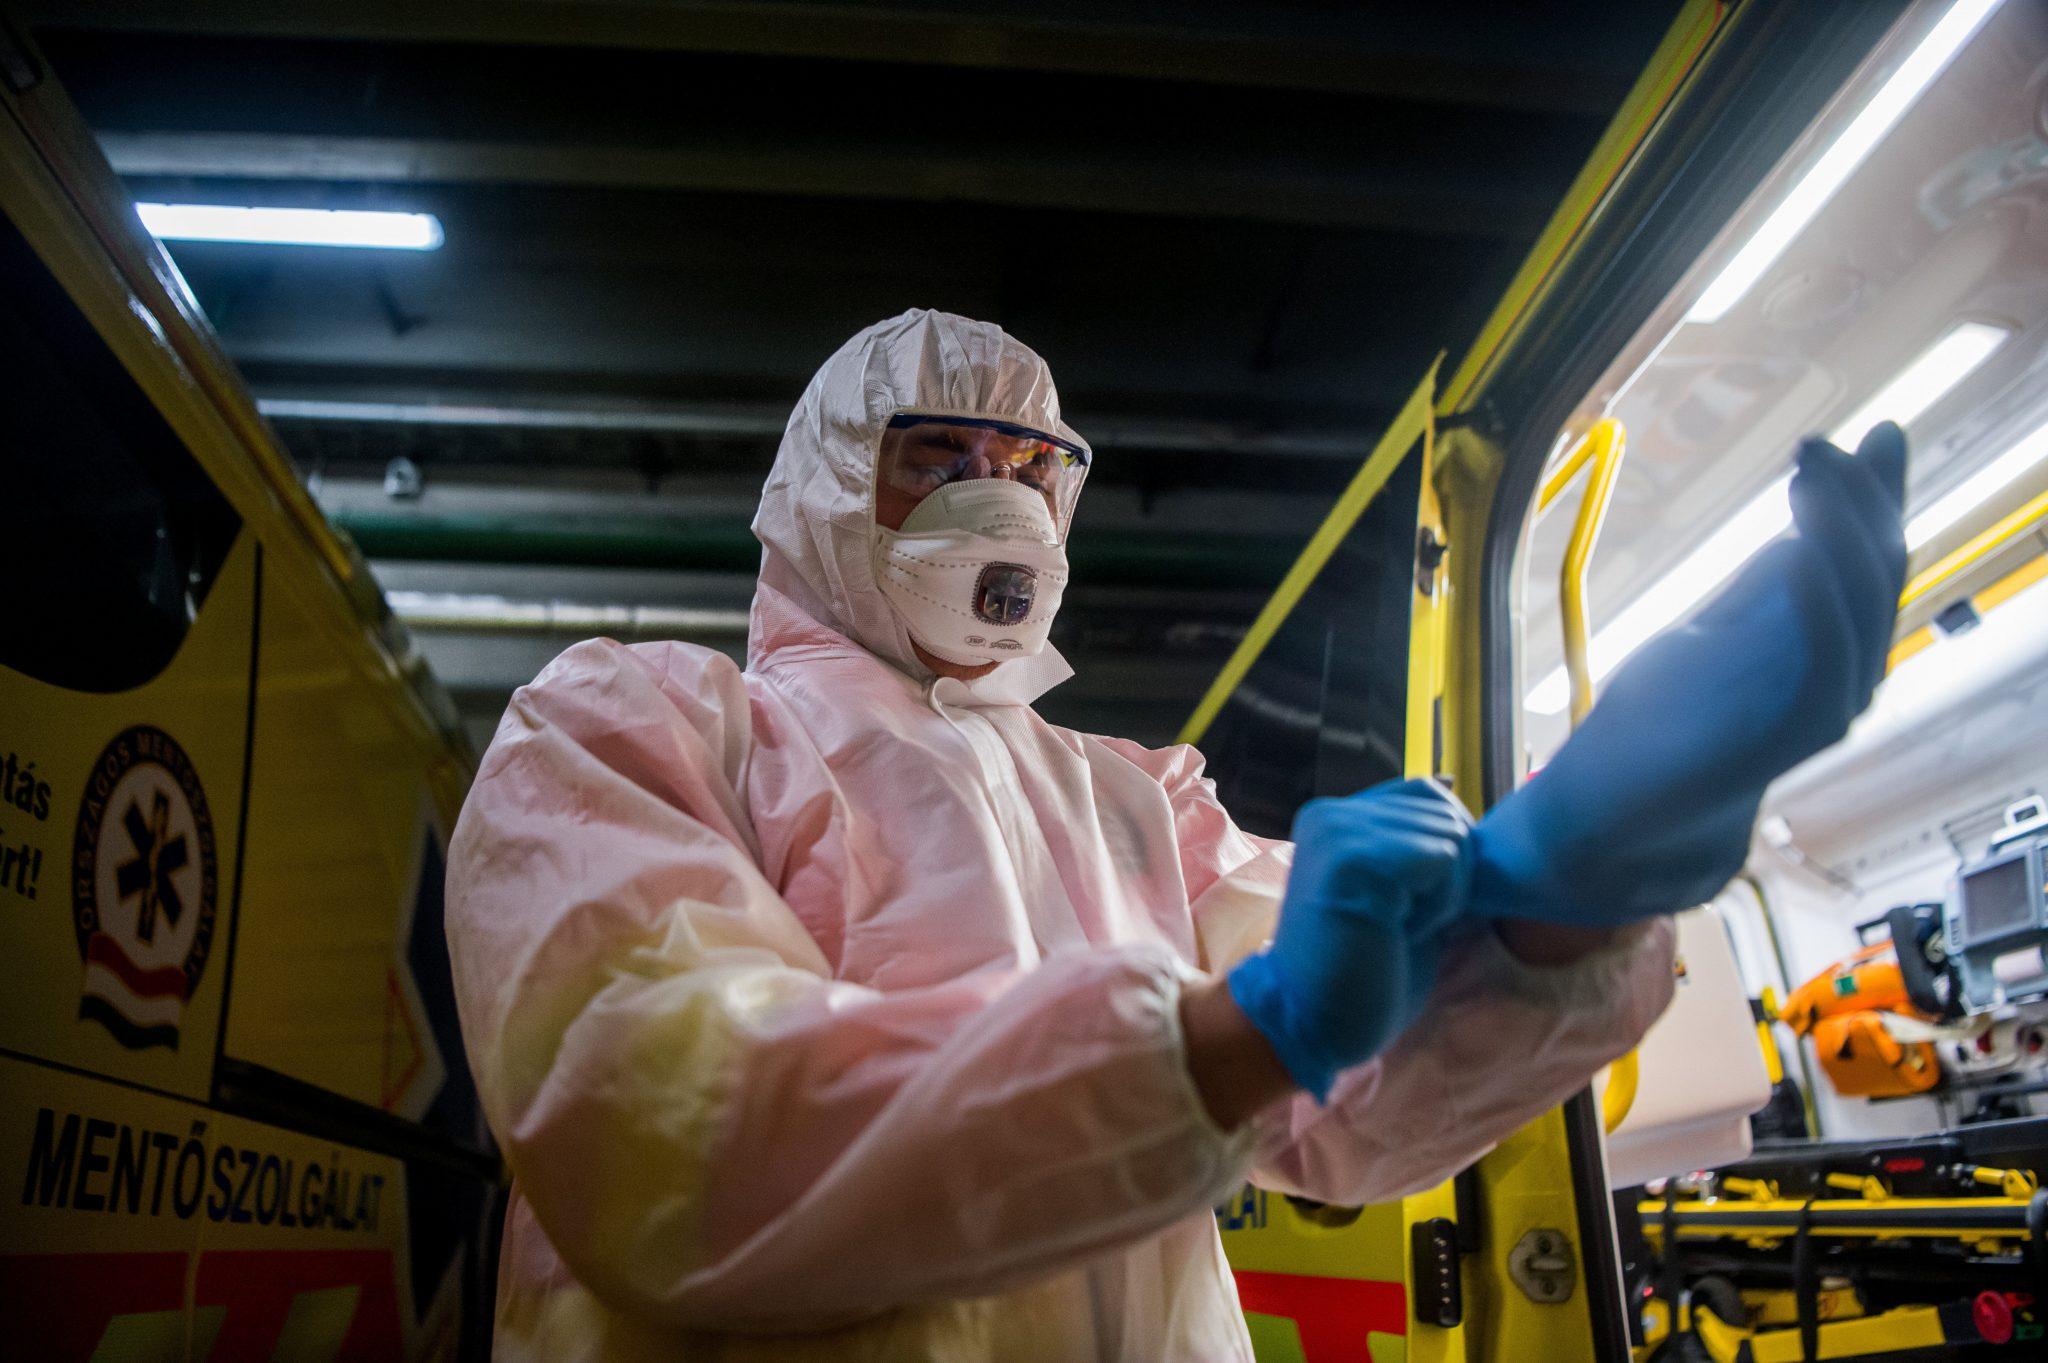 Coronavirus: Gov't Allocates Additional HUF 15 Billions for Medical Equipment post's picture